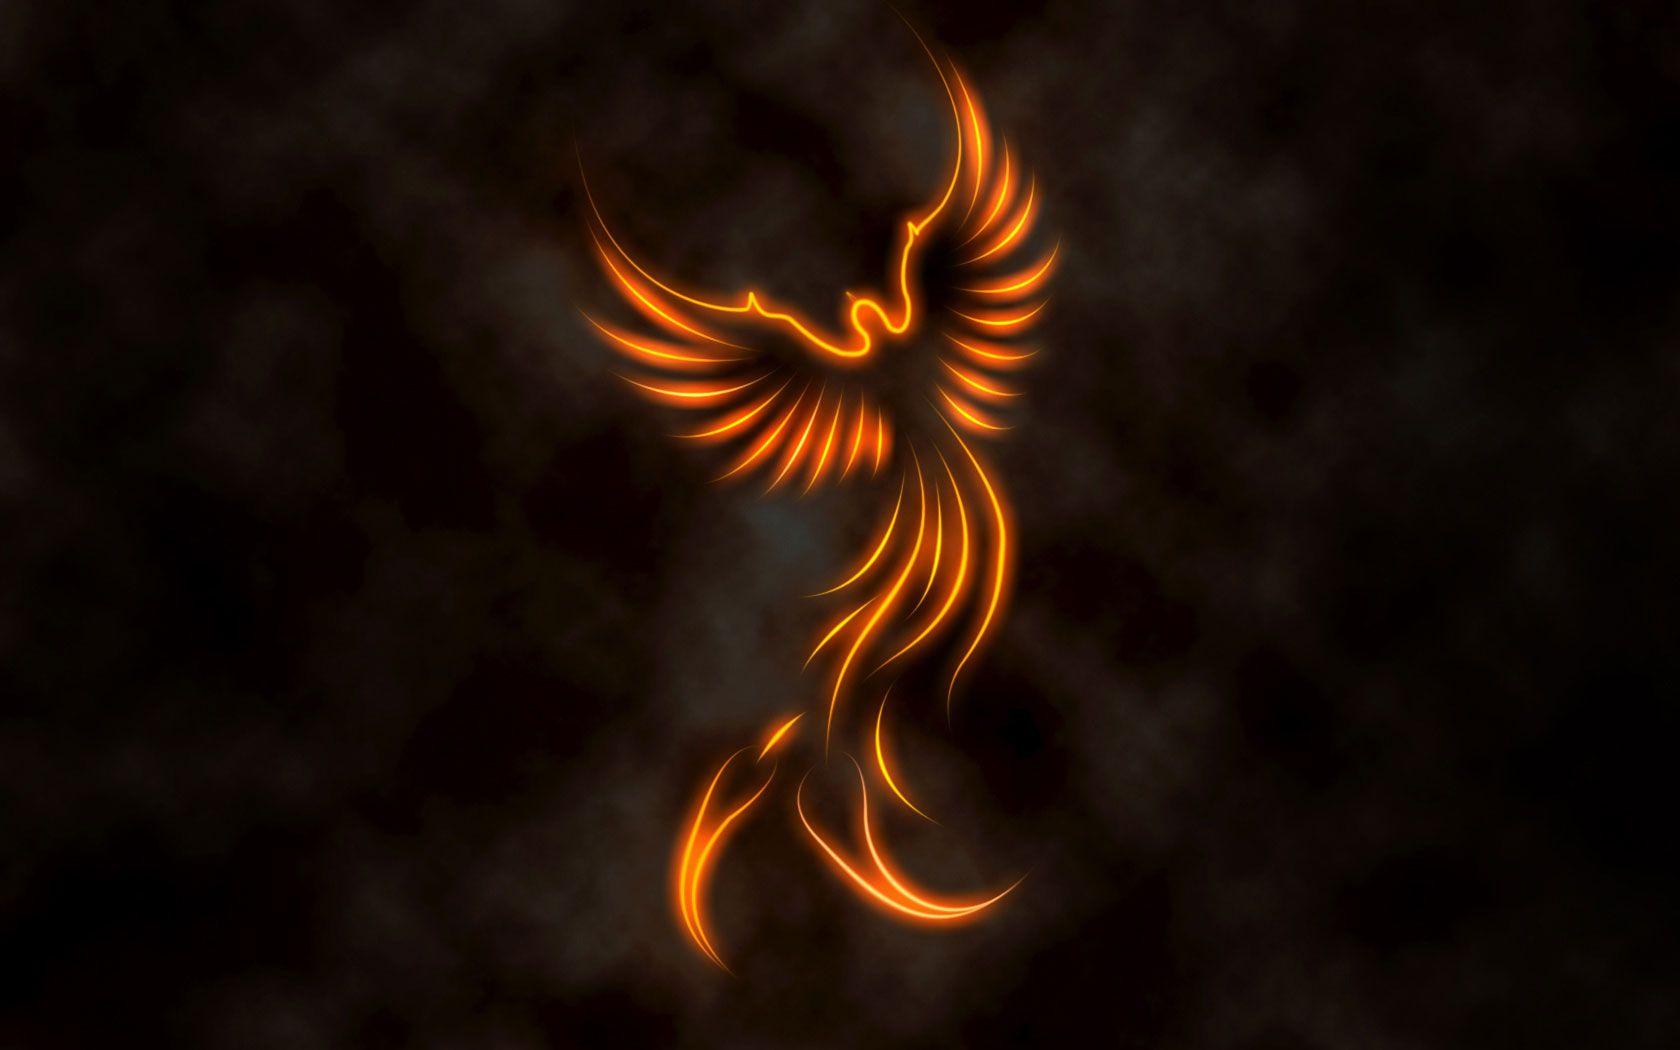 Fire Phoenix Fantasy Art fire phoenix WallpaperBackground 1680 1680x1050